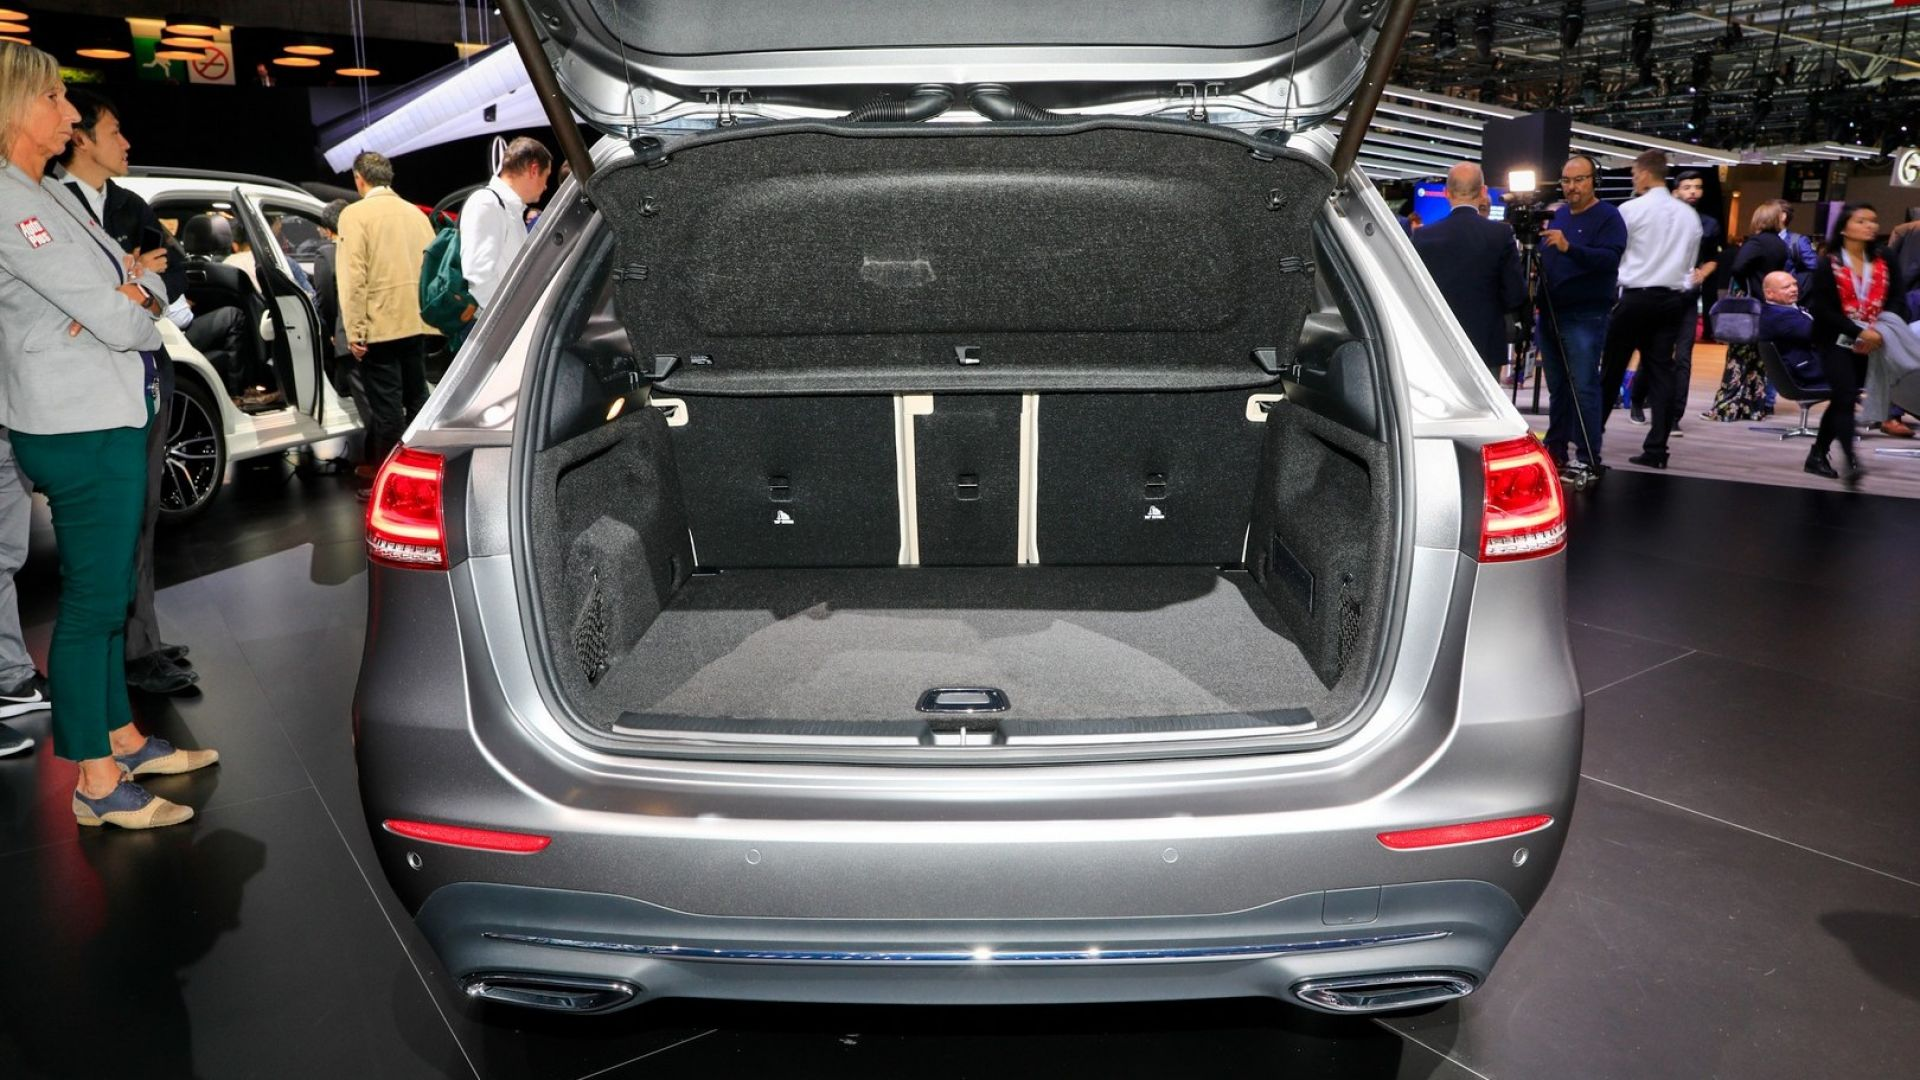 BMW Suv 2017 >> Mercedes Classe B 2019: foto, motori, interni, prezzi ...